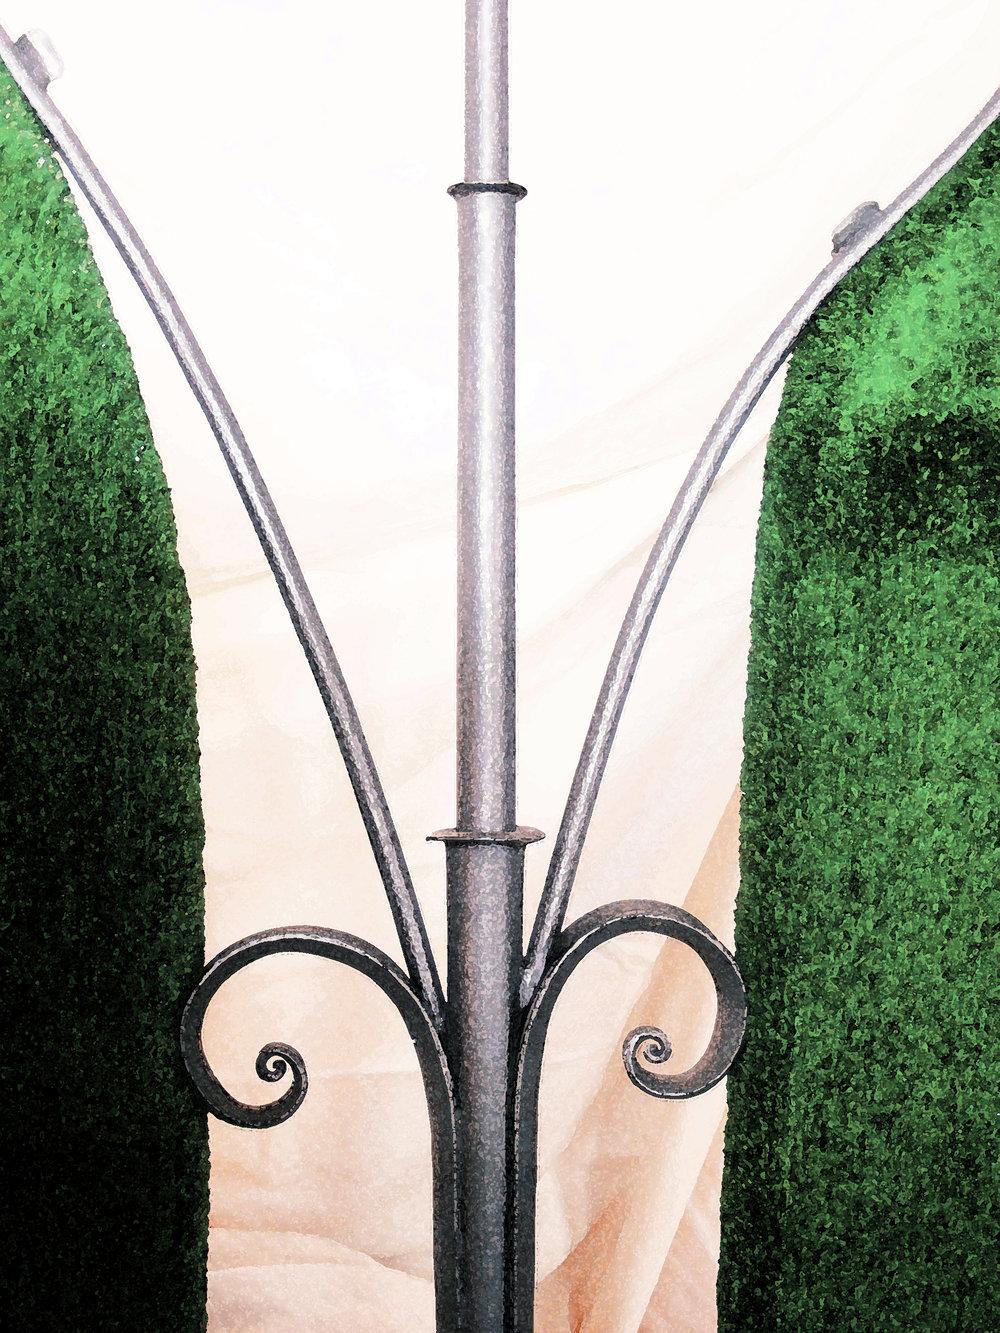 Kamran Gharabagi  - Kunstschmied, Maler   Kamran Gharabaghi geb.1968 in Klagenfurt, Metallmöbel, Objekte, Malereien. Lebt und arbeitet in Kärnten.